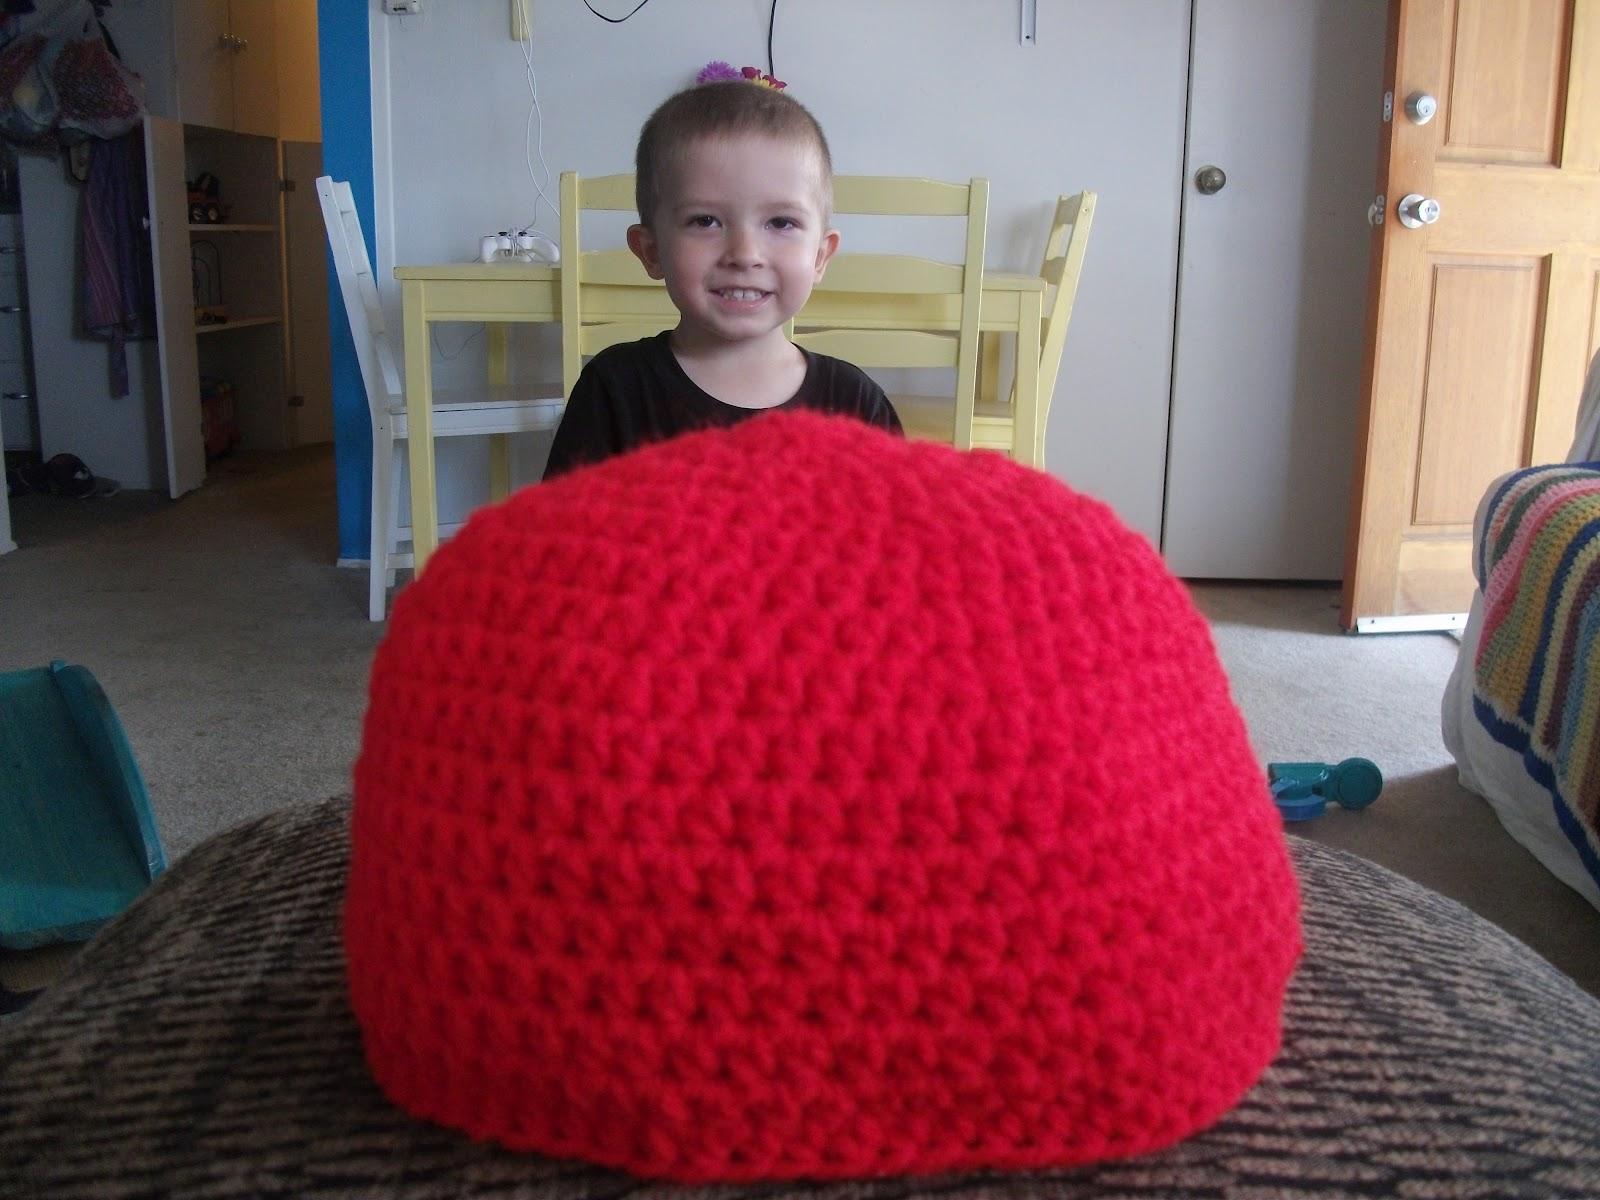 The Making Of Spiderman Crochet Hat Melodycrochet